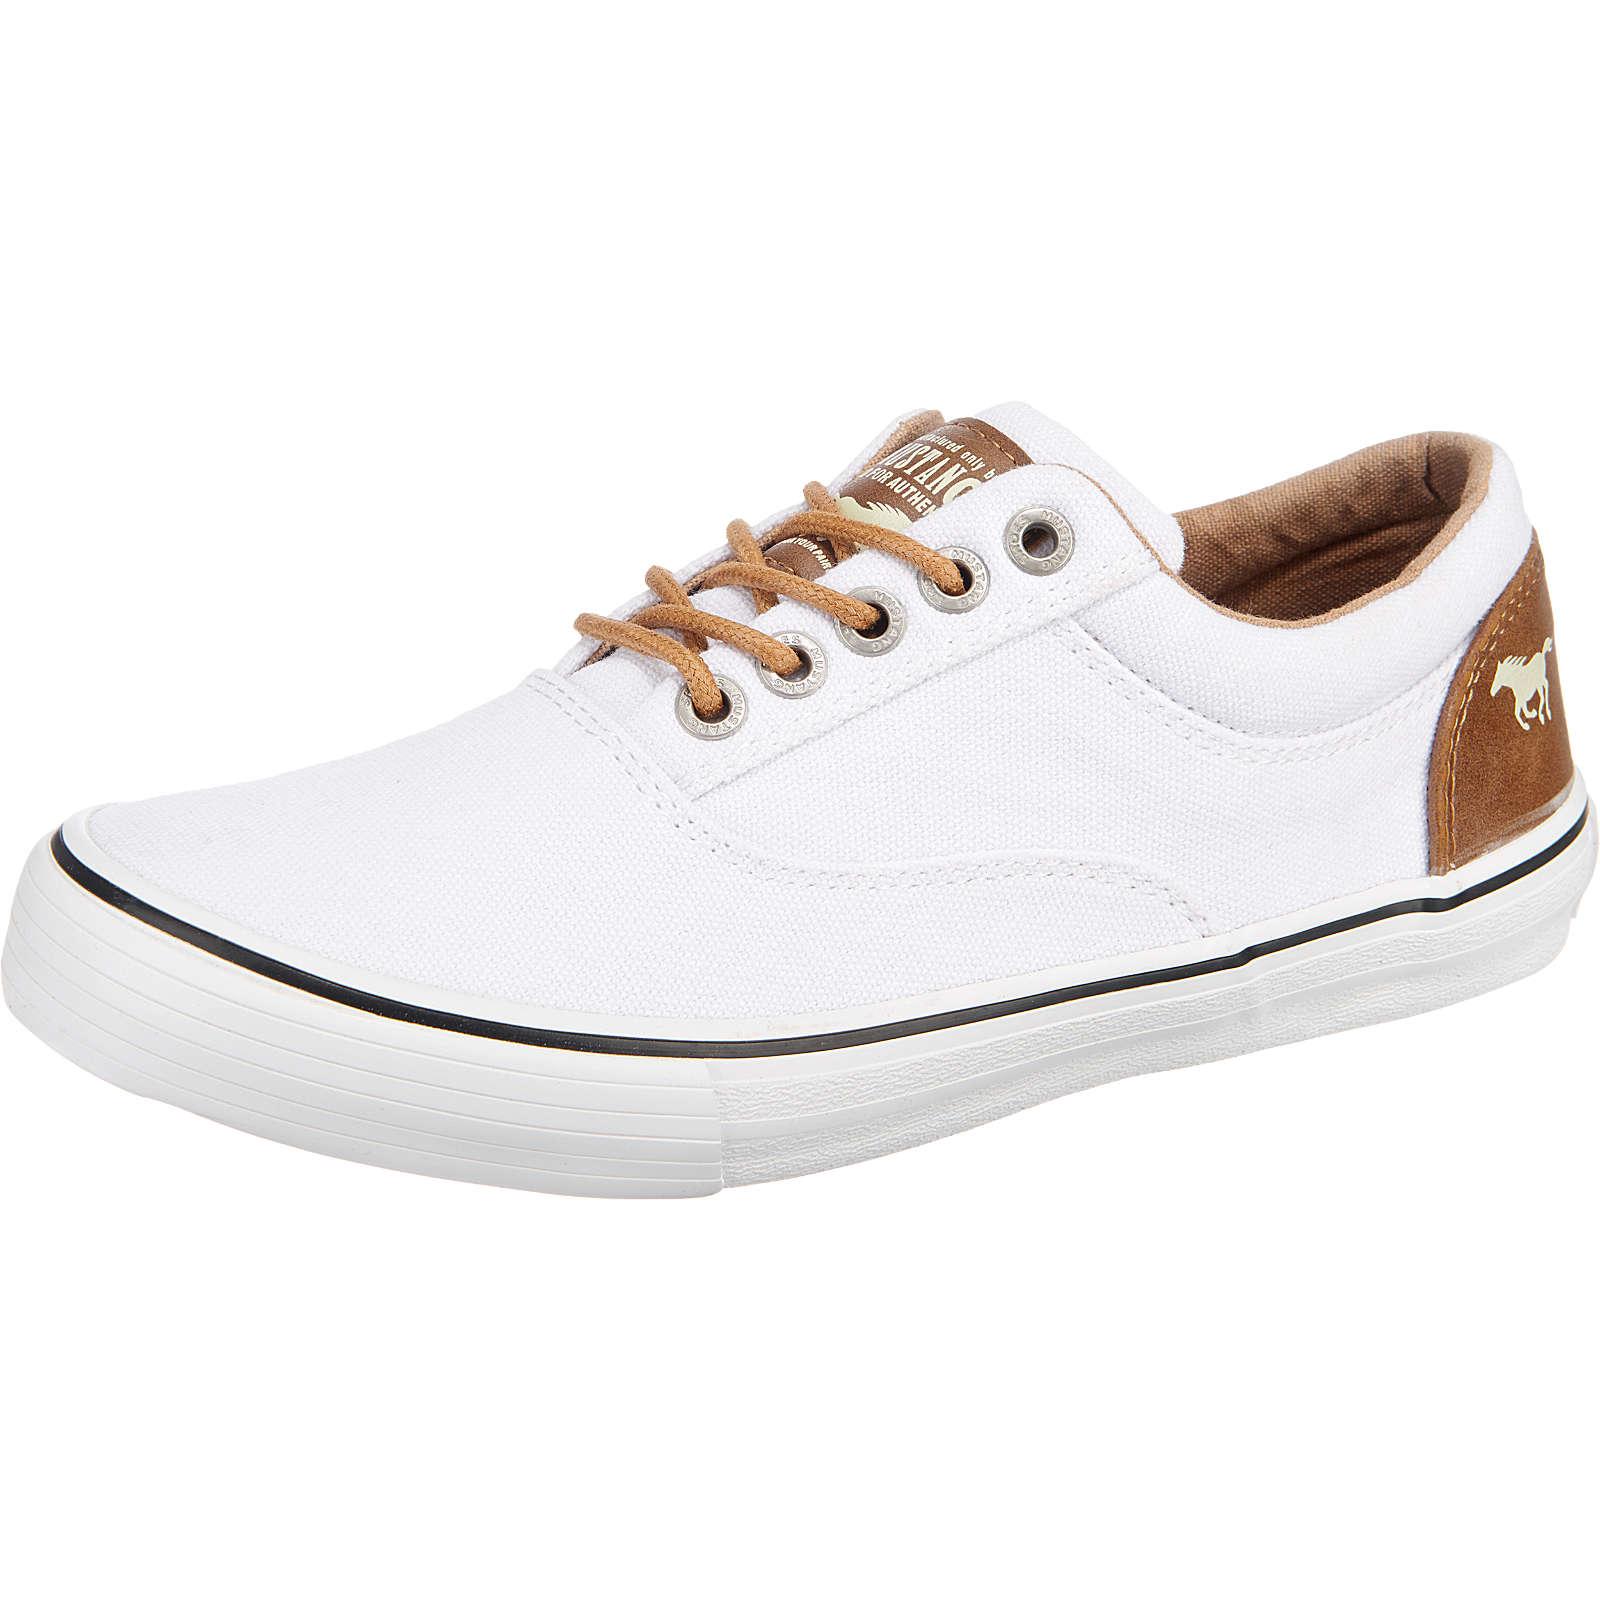 MUSTANG Sneakers Low weiß Damen Gr. 37